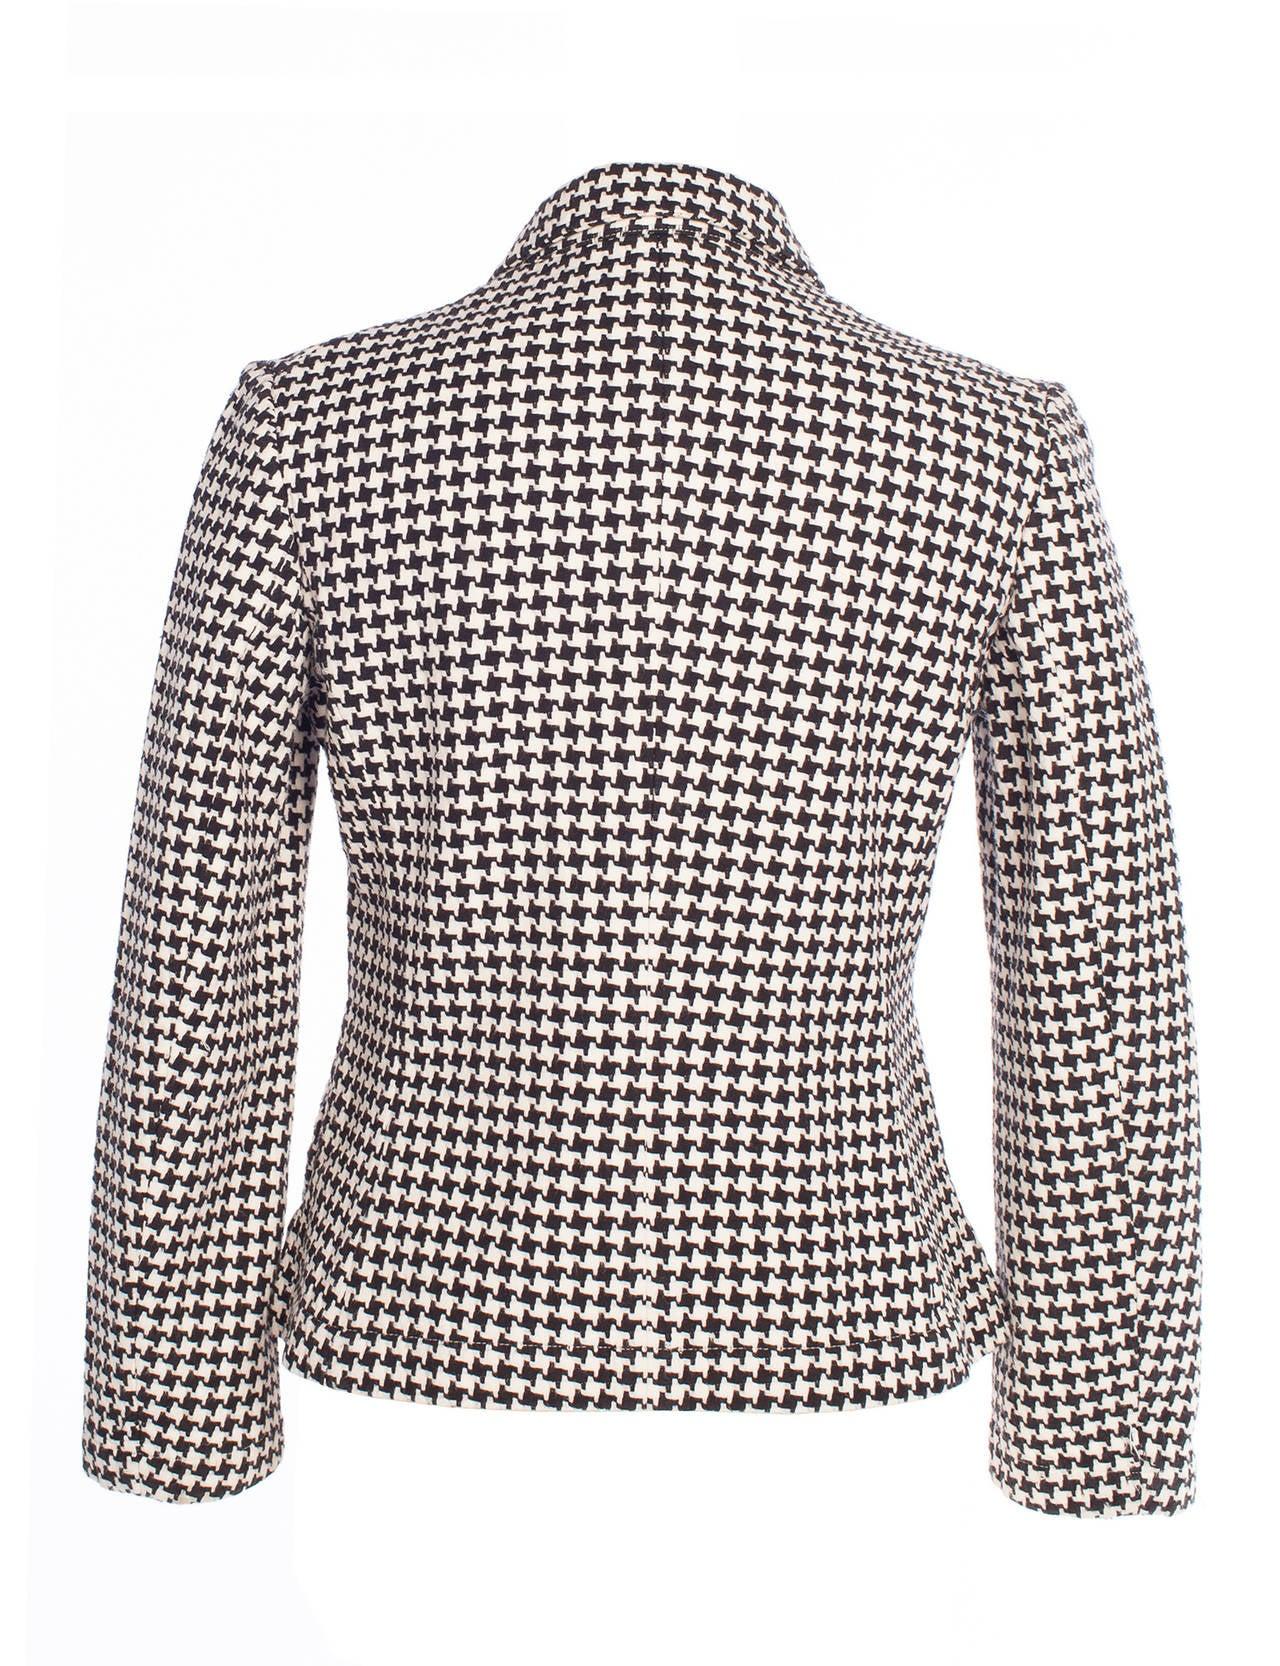 Comme des Garcons *Robe de Chambre* houndstooth printed blazer, Sz. M ...